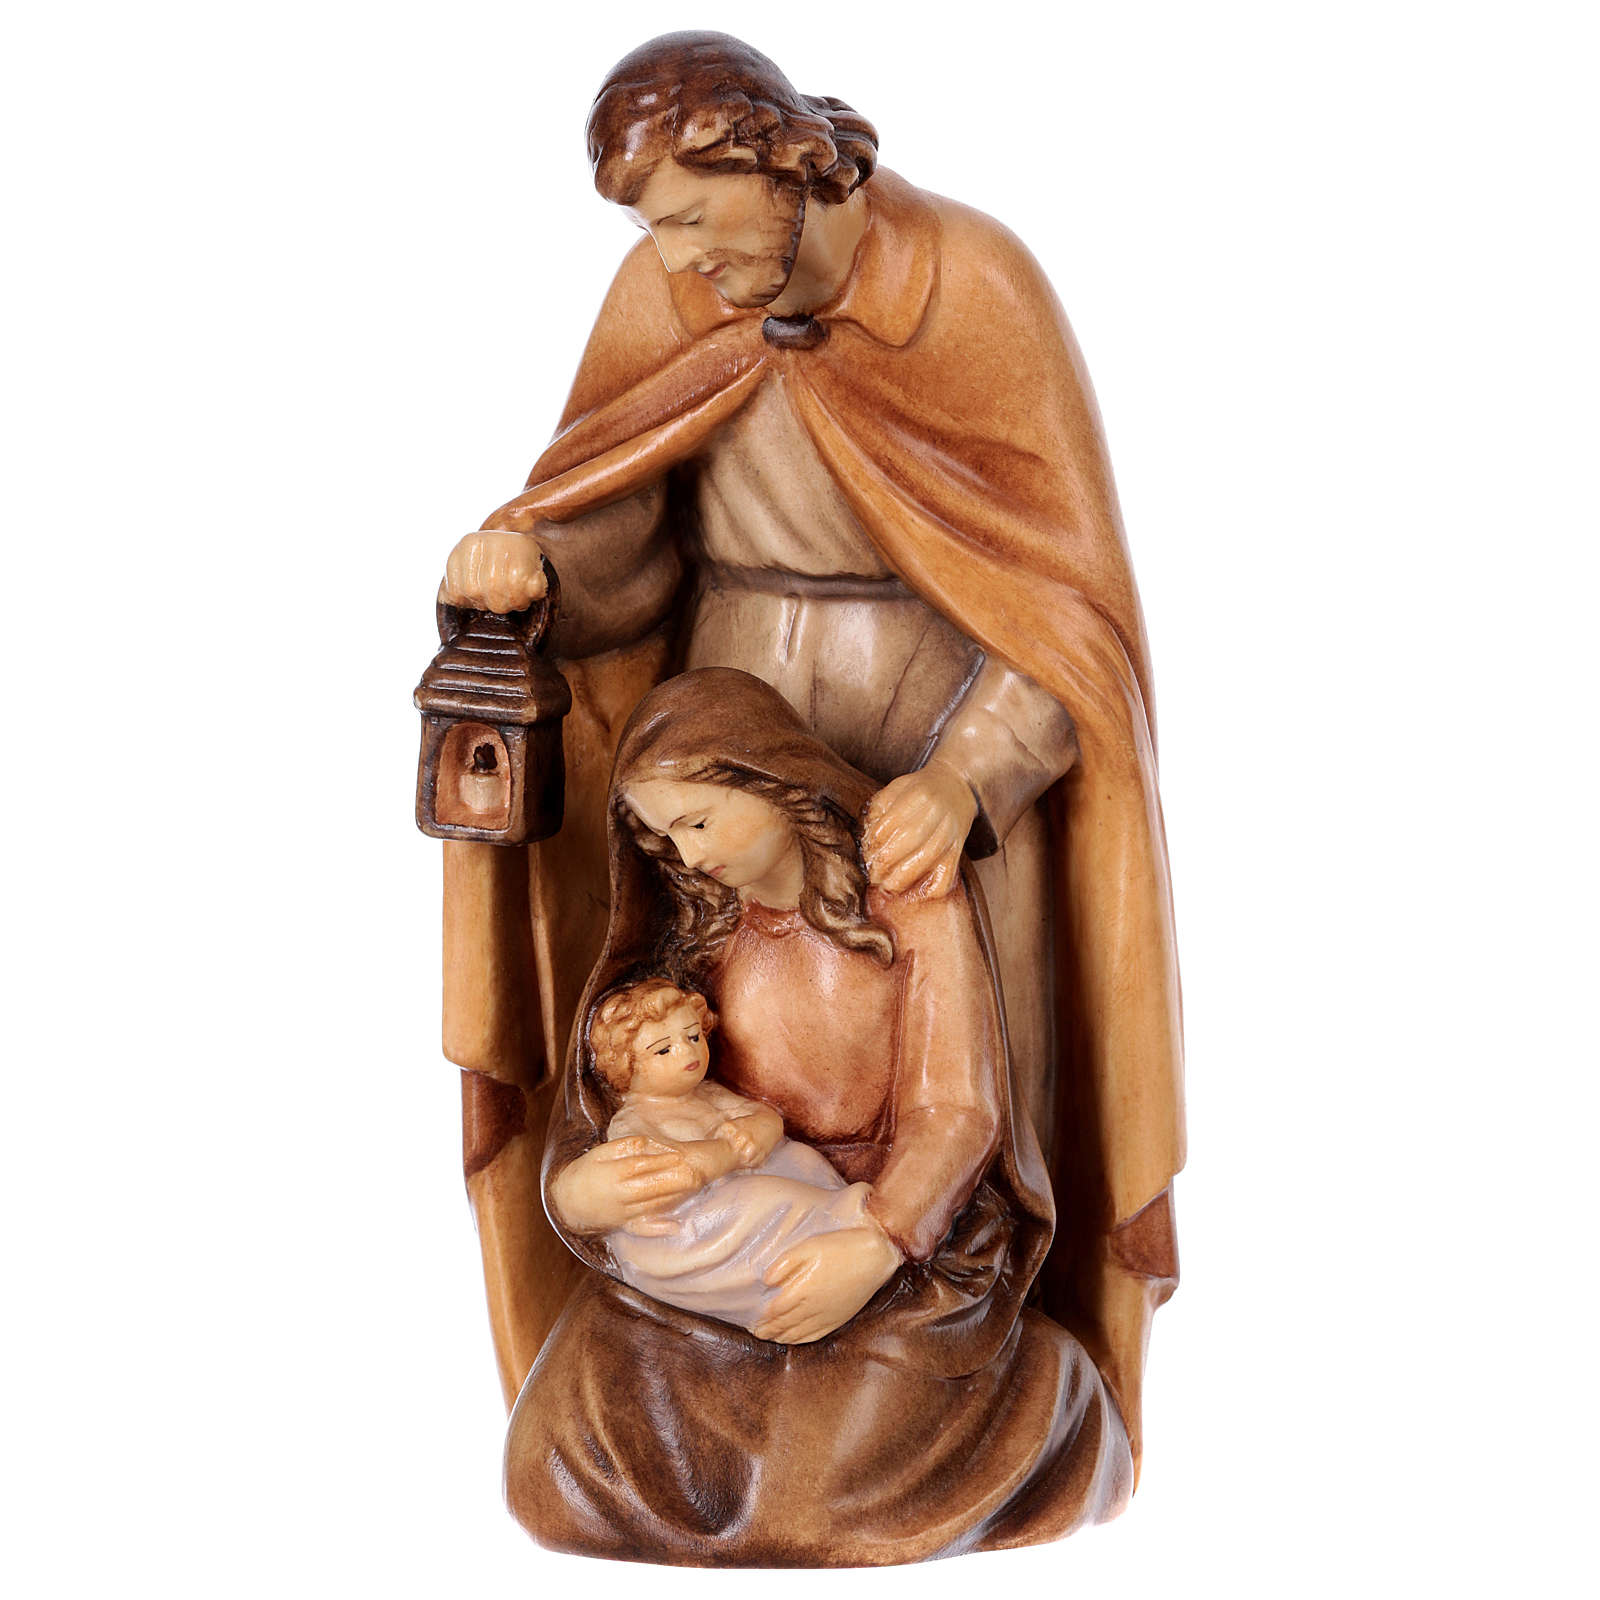 Estatua Sagrada Familia de madera, acabado con diferentes matices de marrón 4